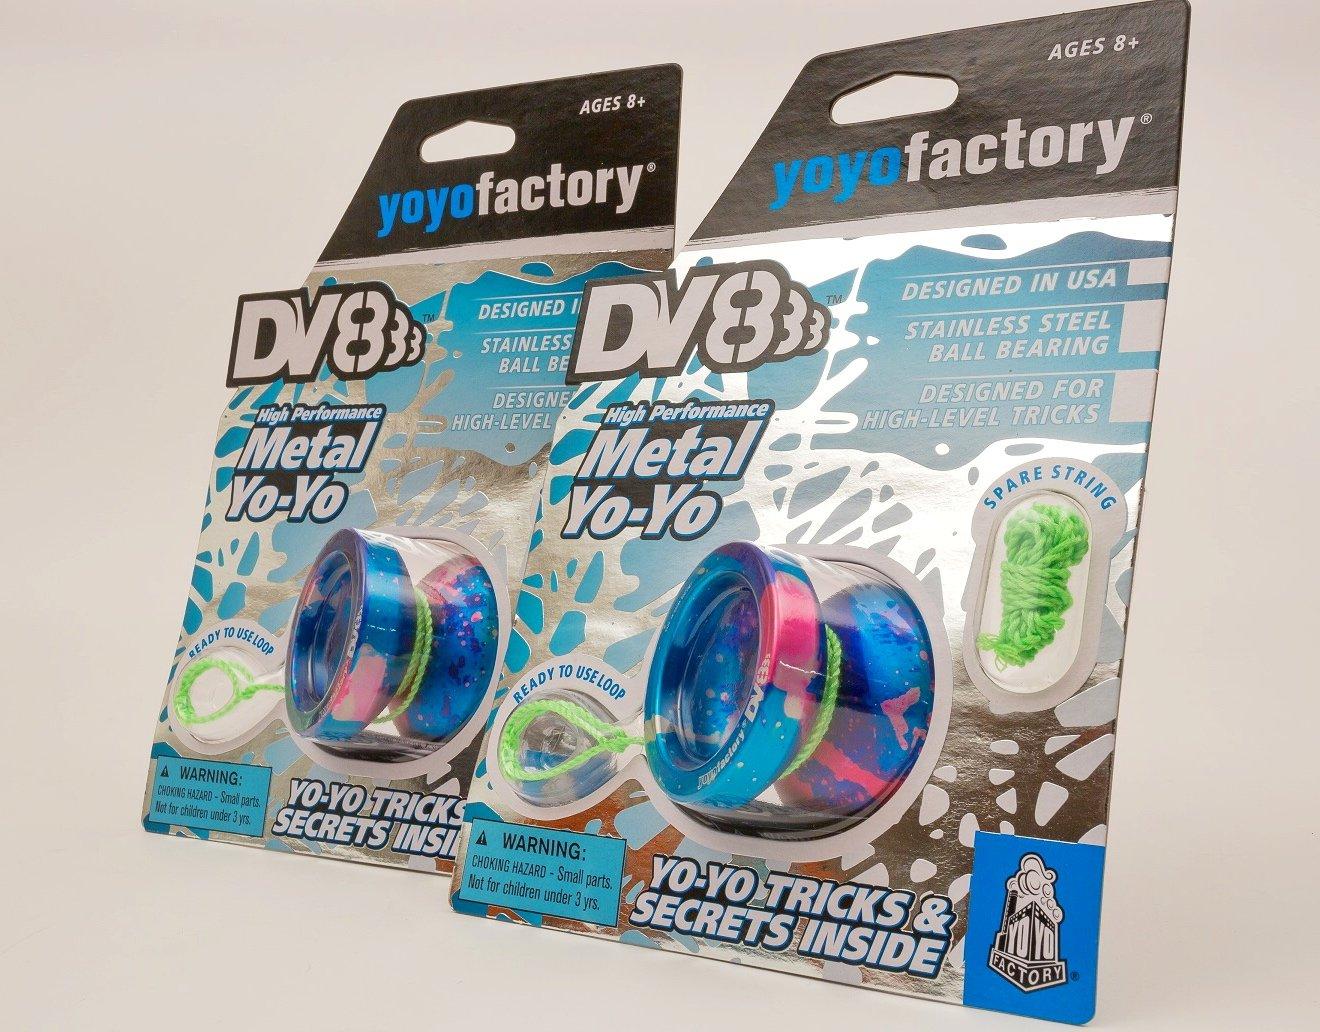 YoYoFactory DV888 Ball Bearing Matal - Galaxy Acid Wash